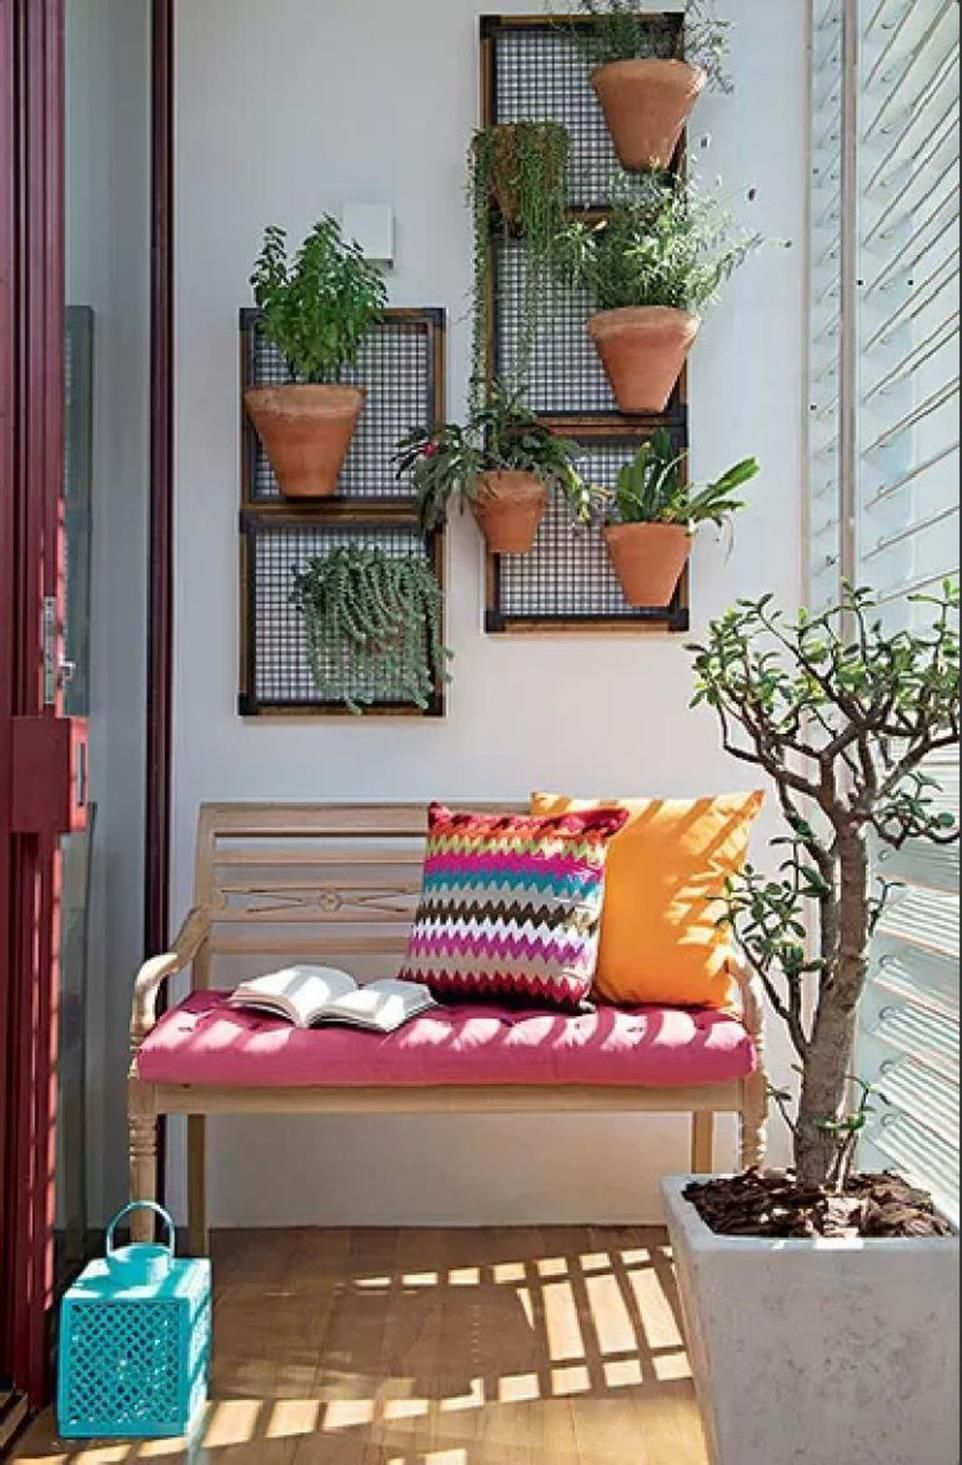 39 simple but beautiful balcony decorating ideas